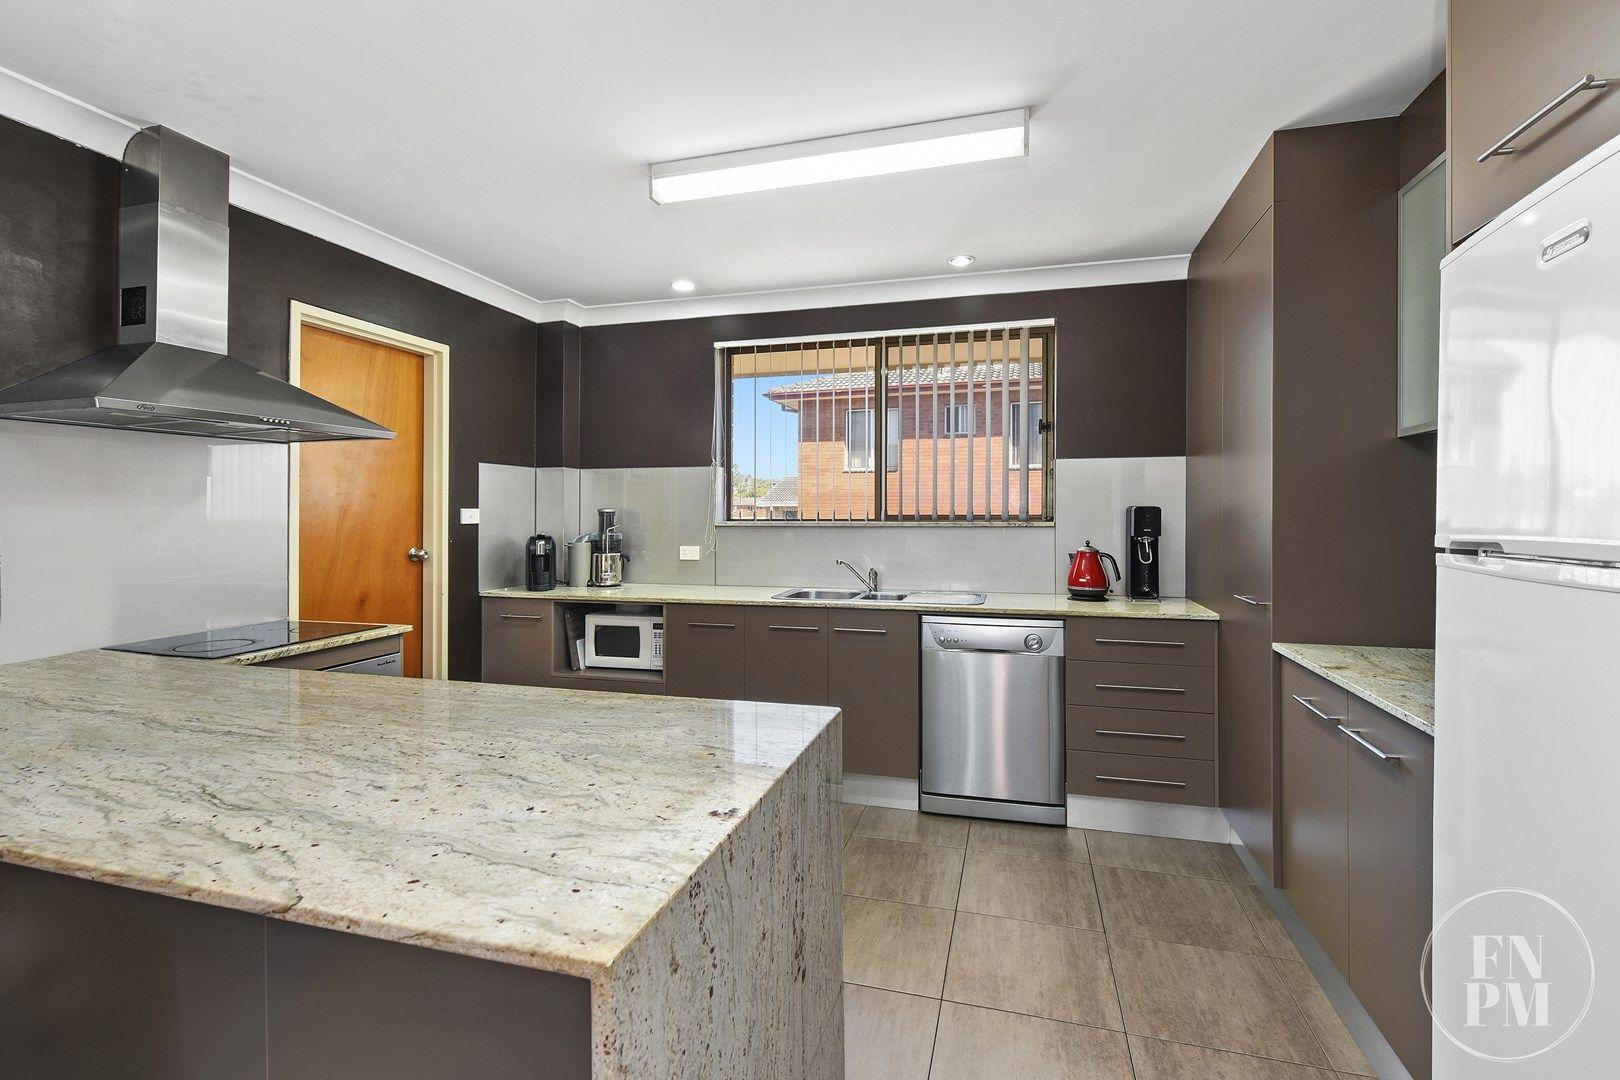 16/11-15 Hollingworth Street, Port Macquarie NSW 2444, Image 0